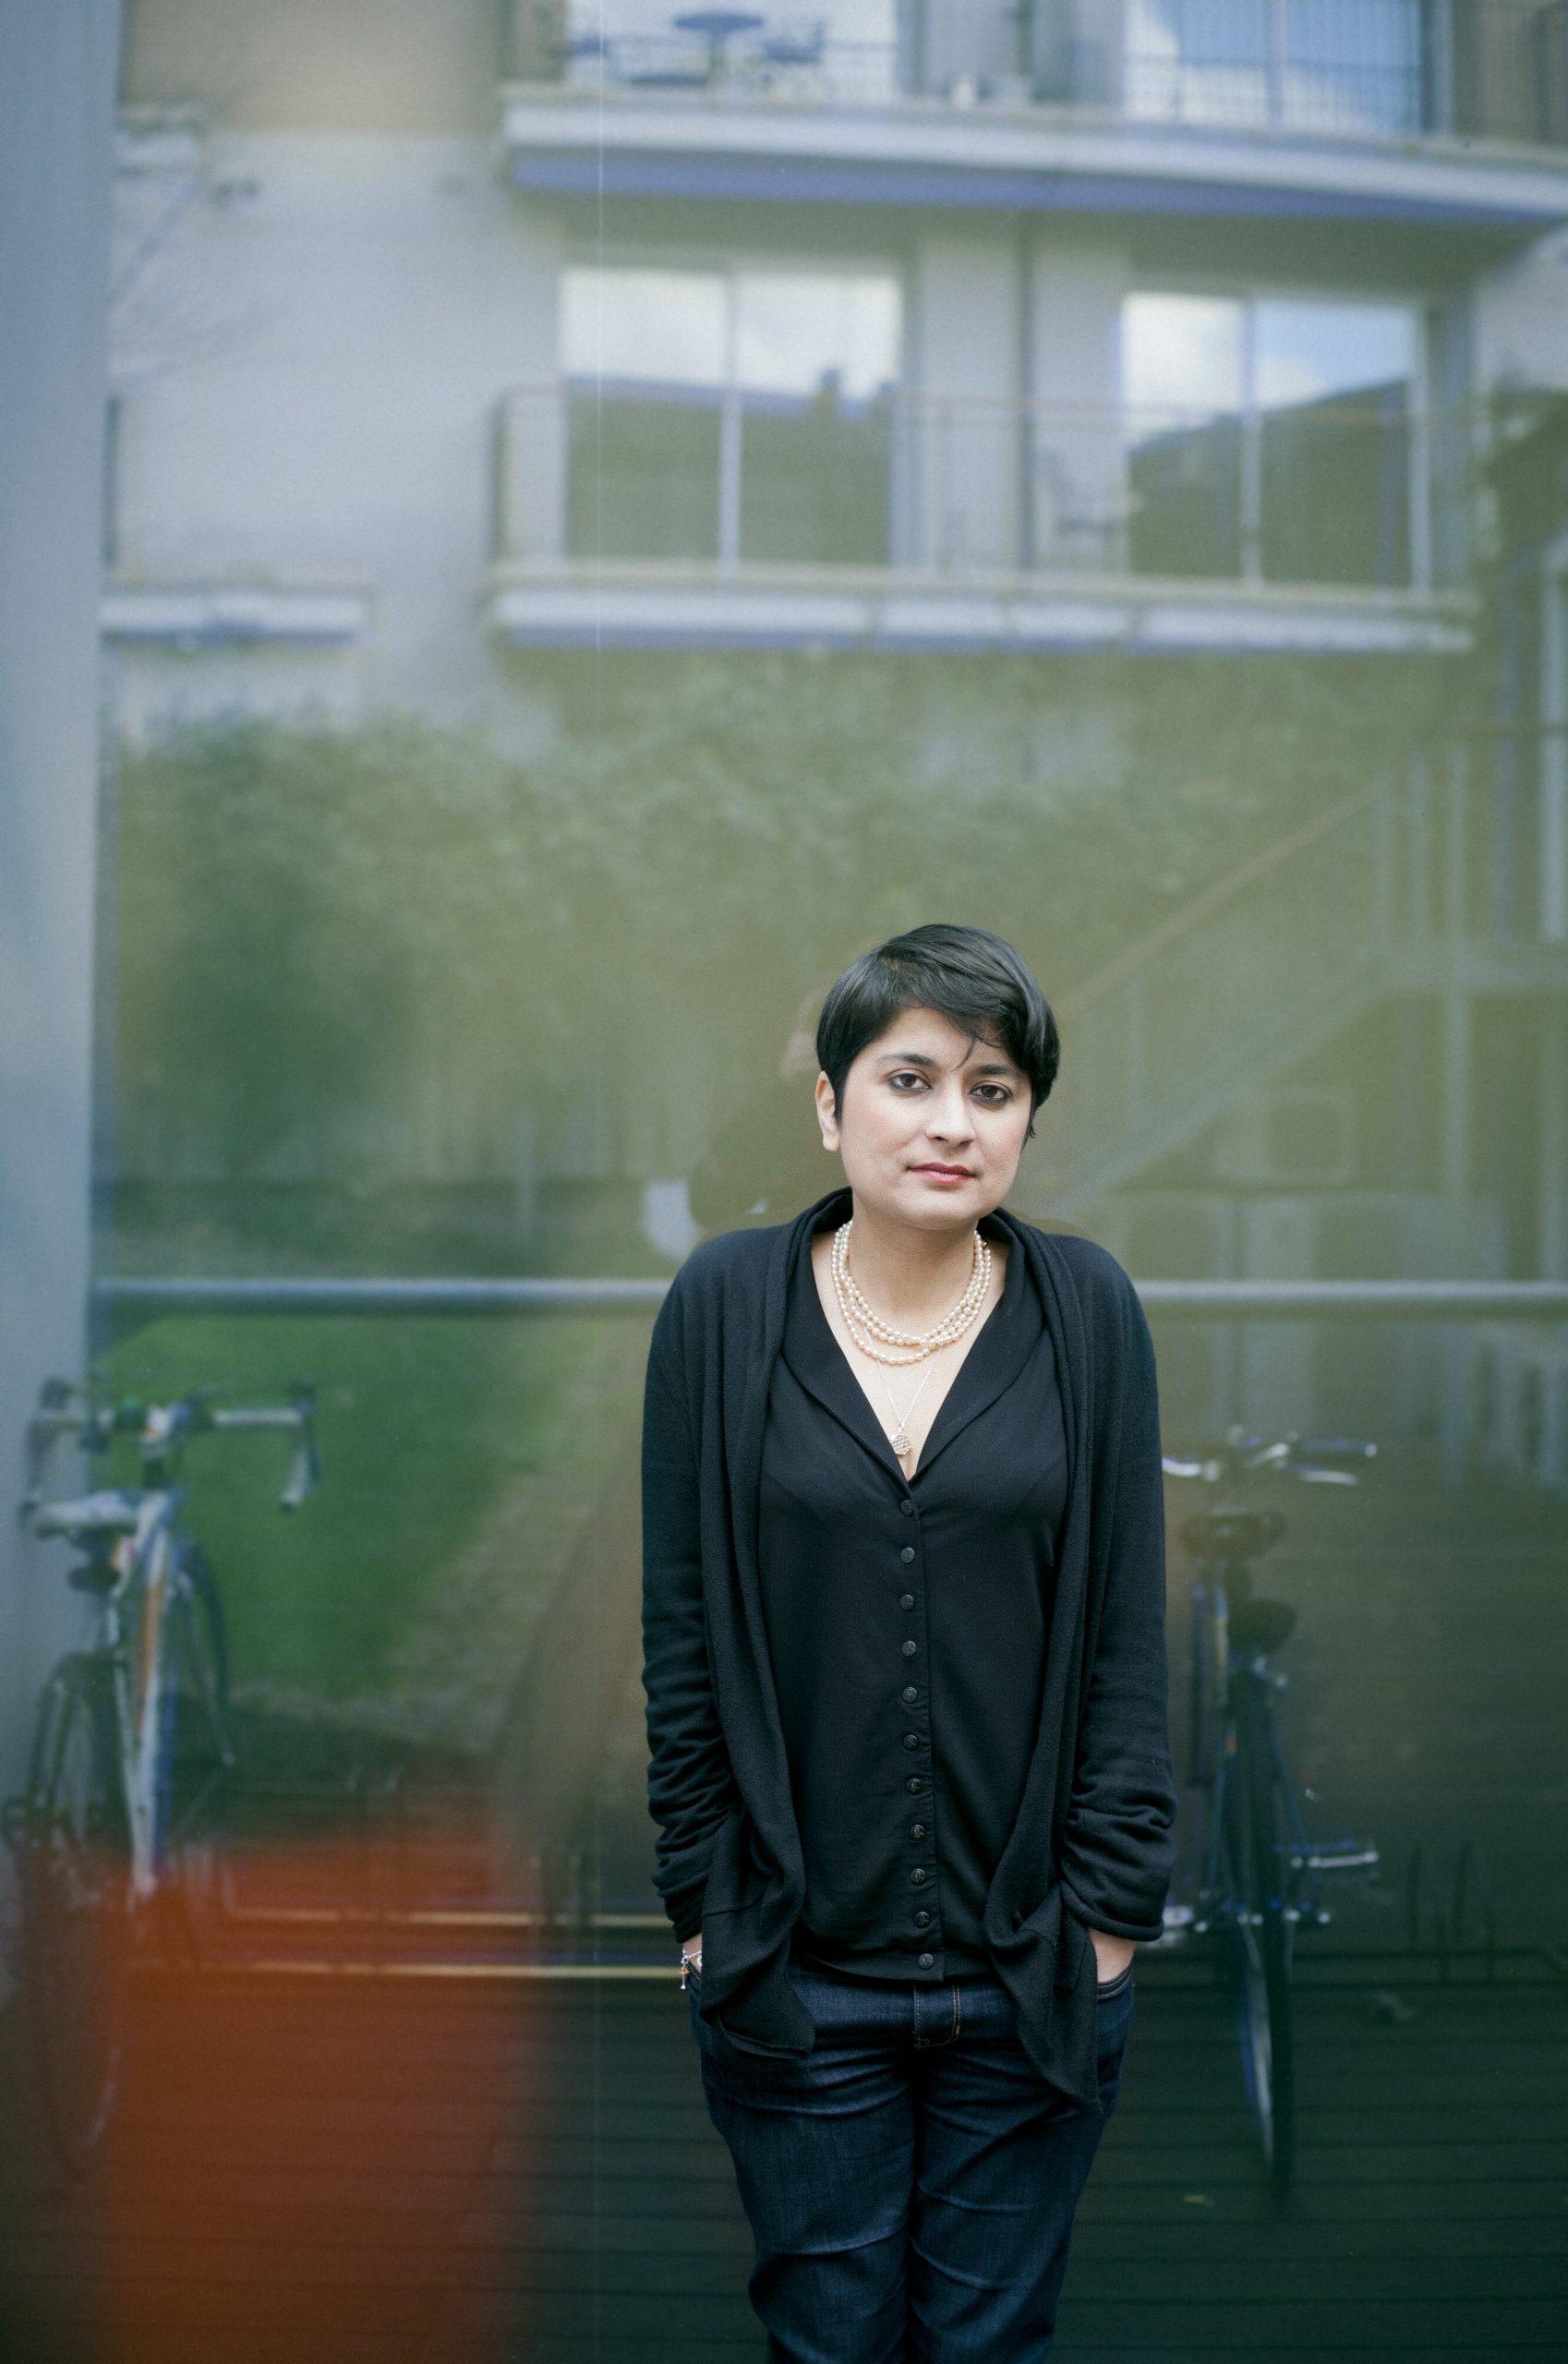 Shami Chakrabarti - (c) Jo Metson-Scott - NEW - USE THIS